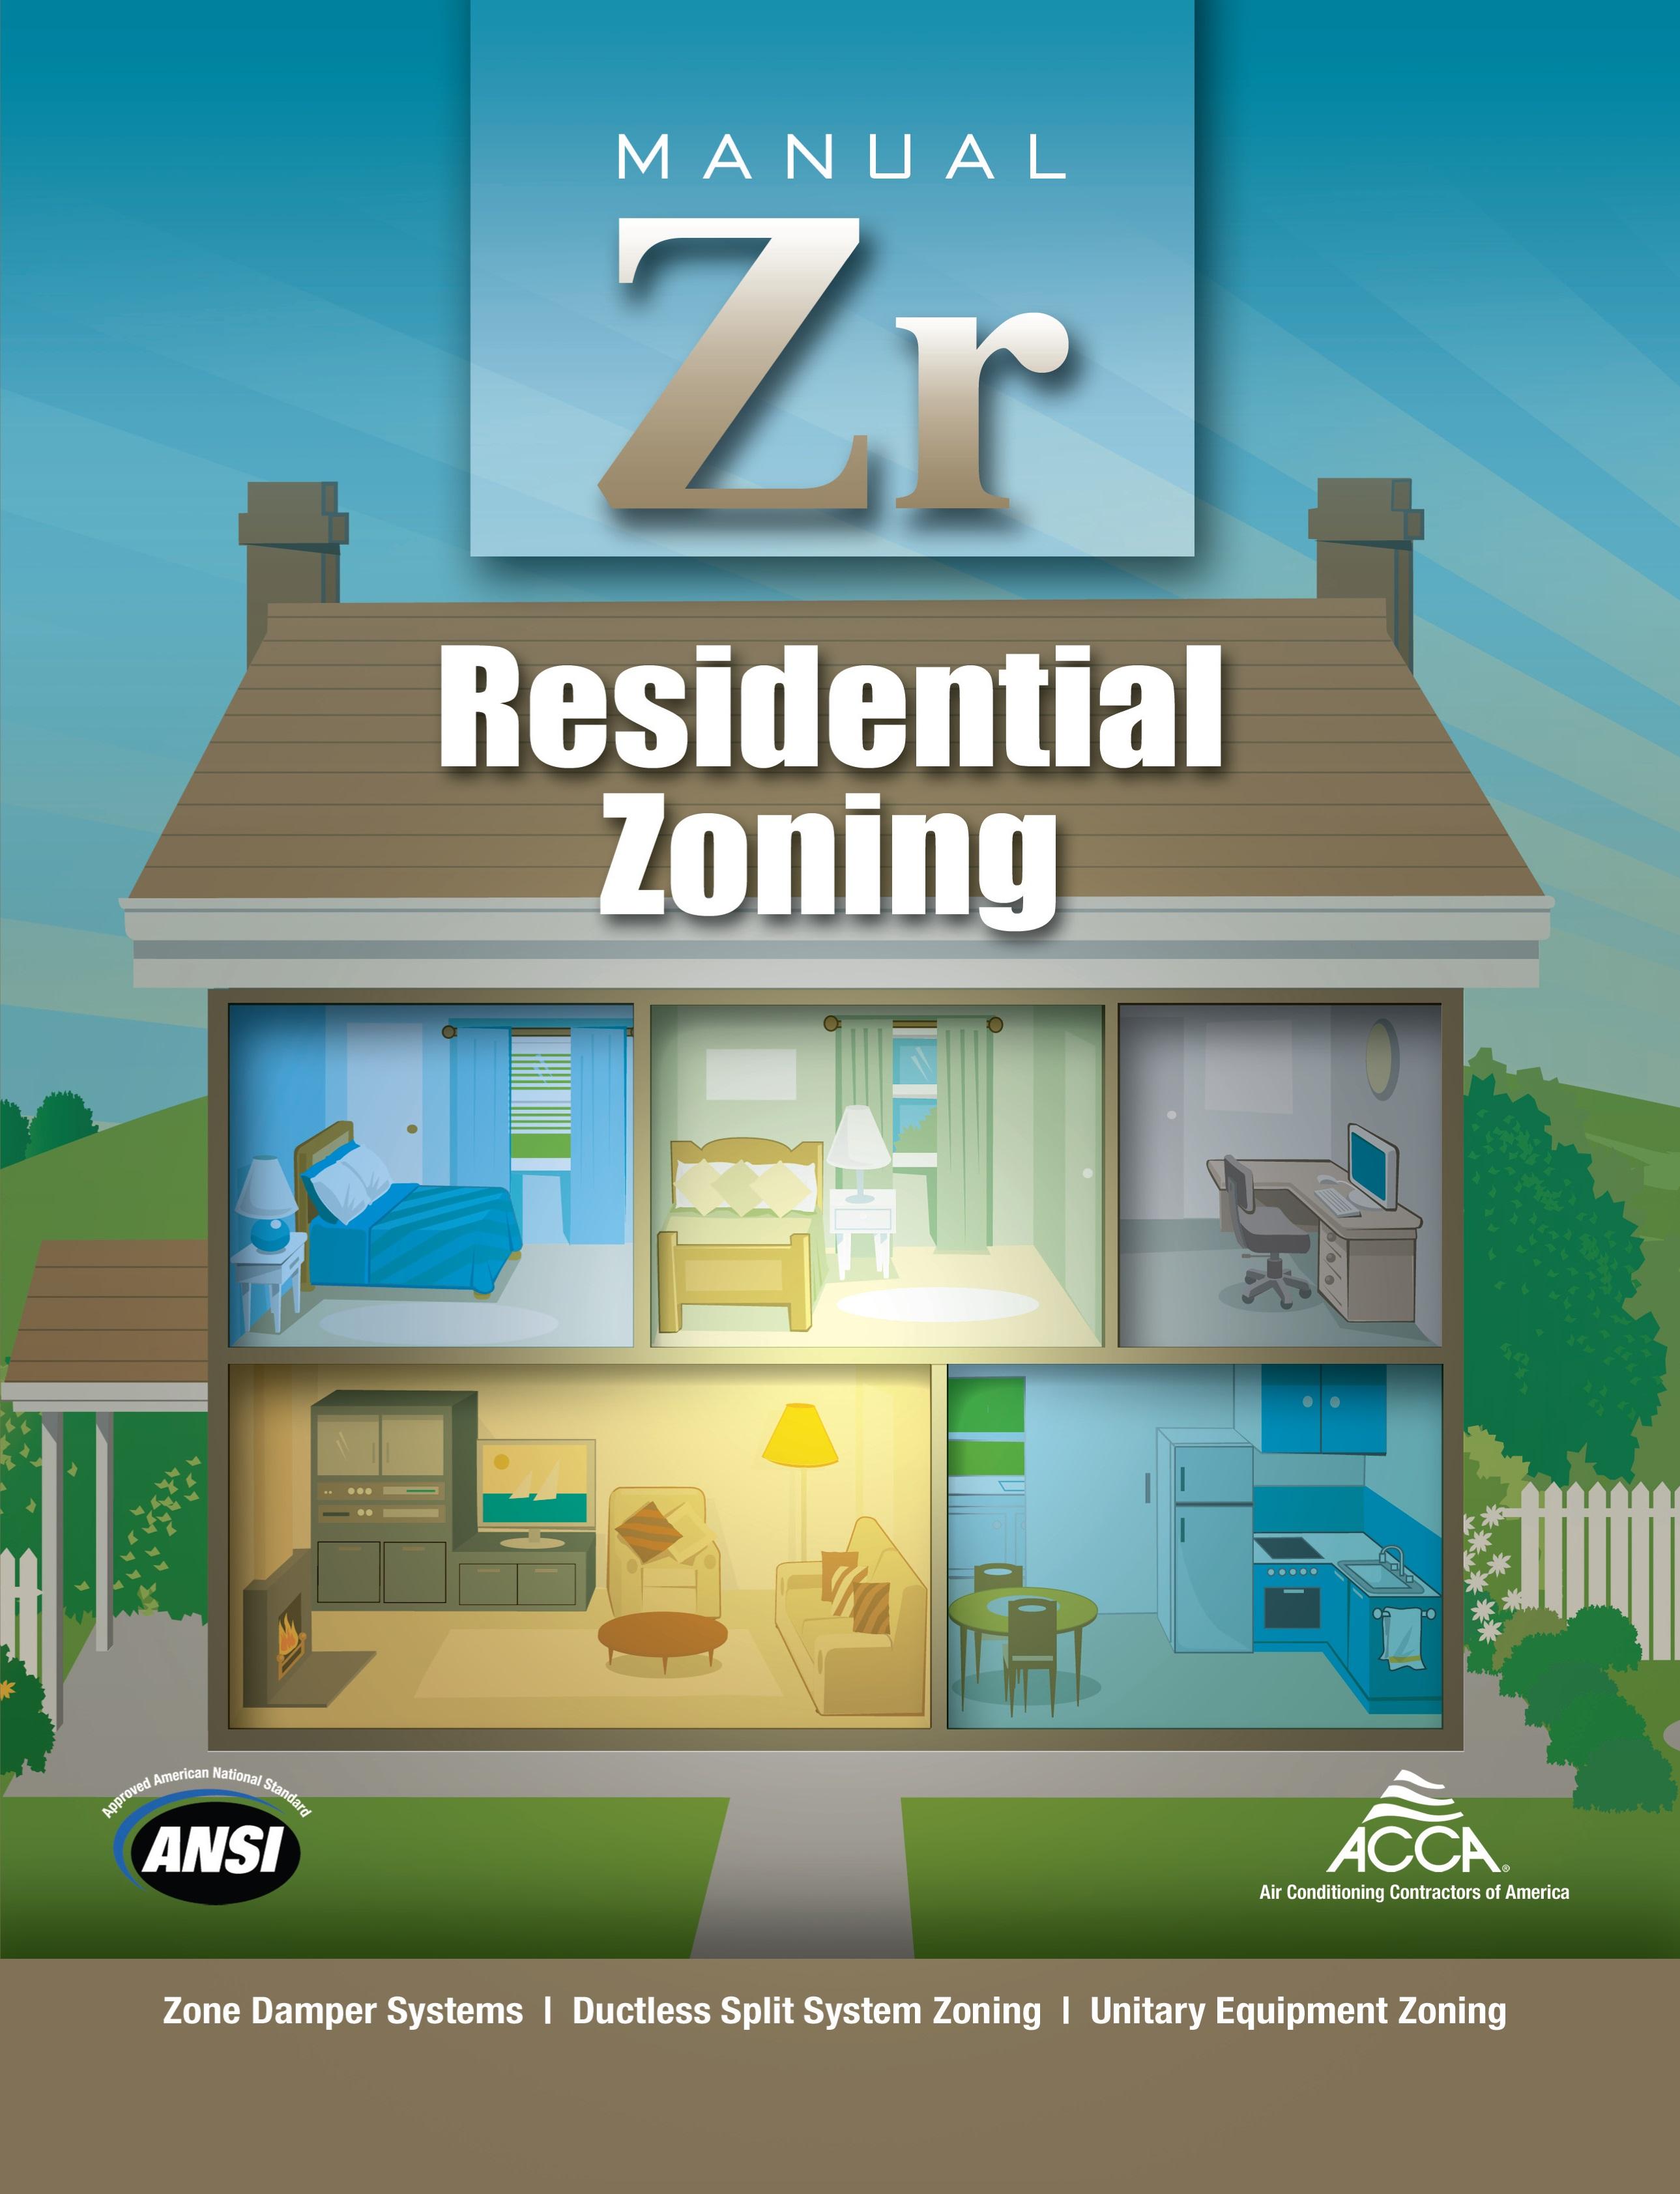 Manual Zr [ANSI/ACCA 11 Manual ZR - 2018]